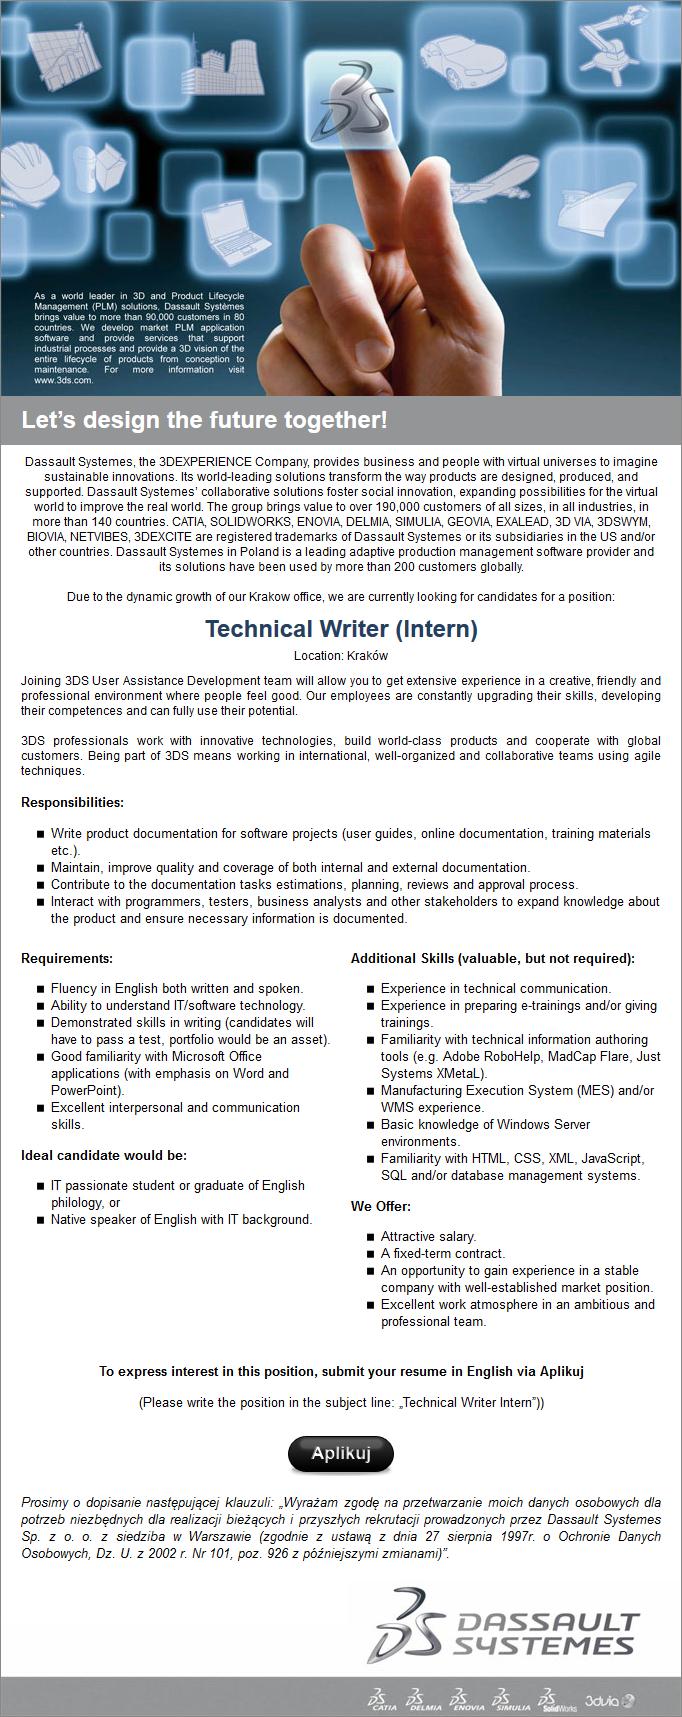 tech_writer_intern_3ds